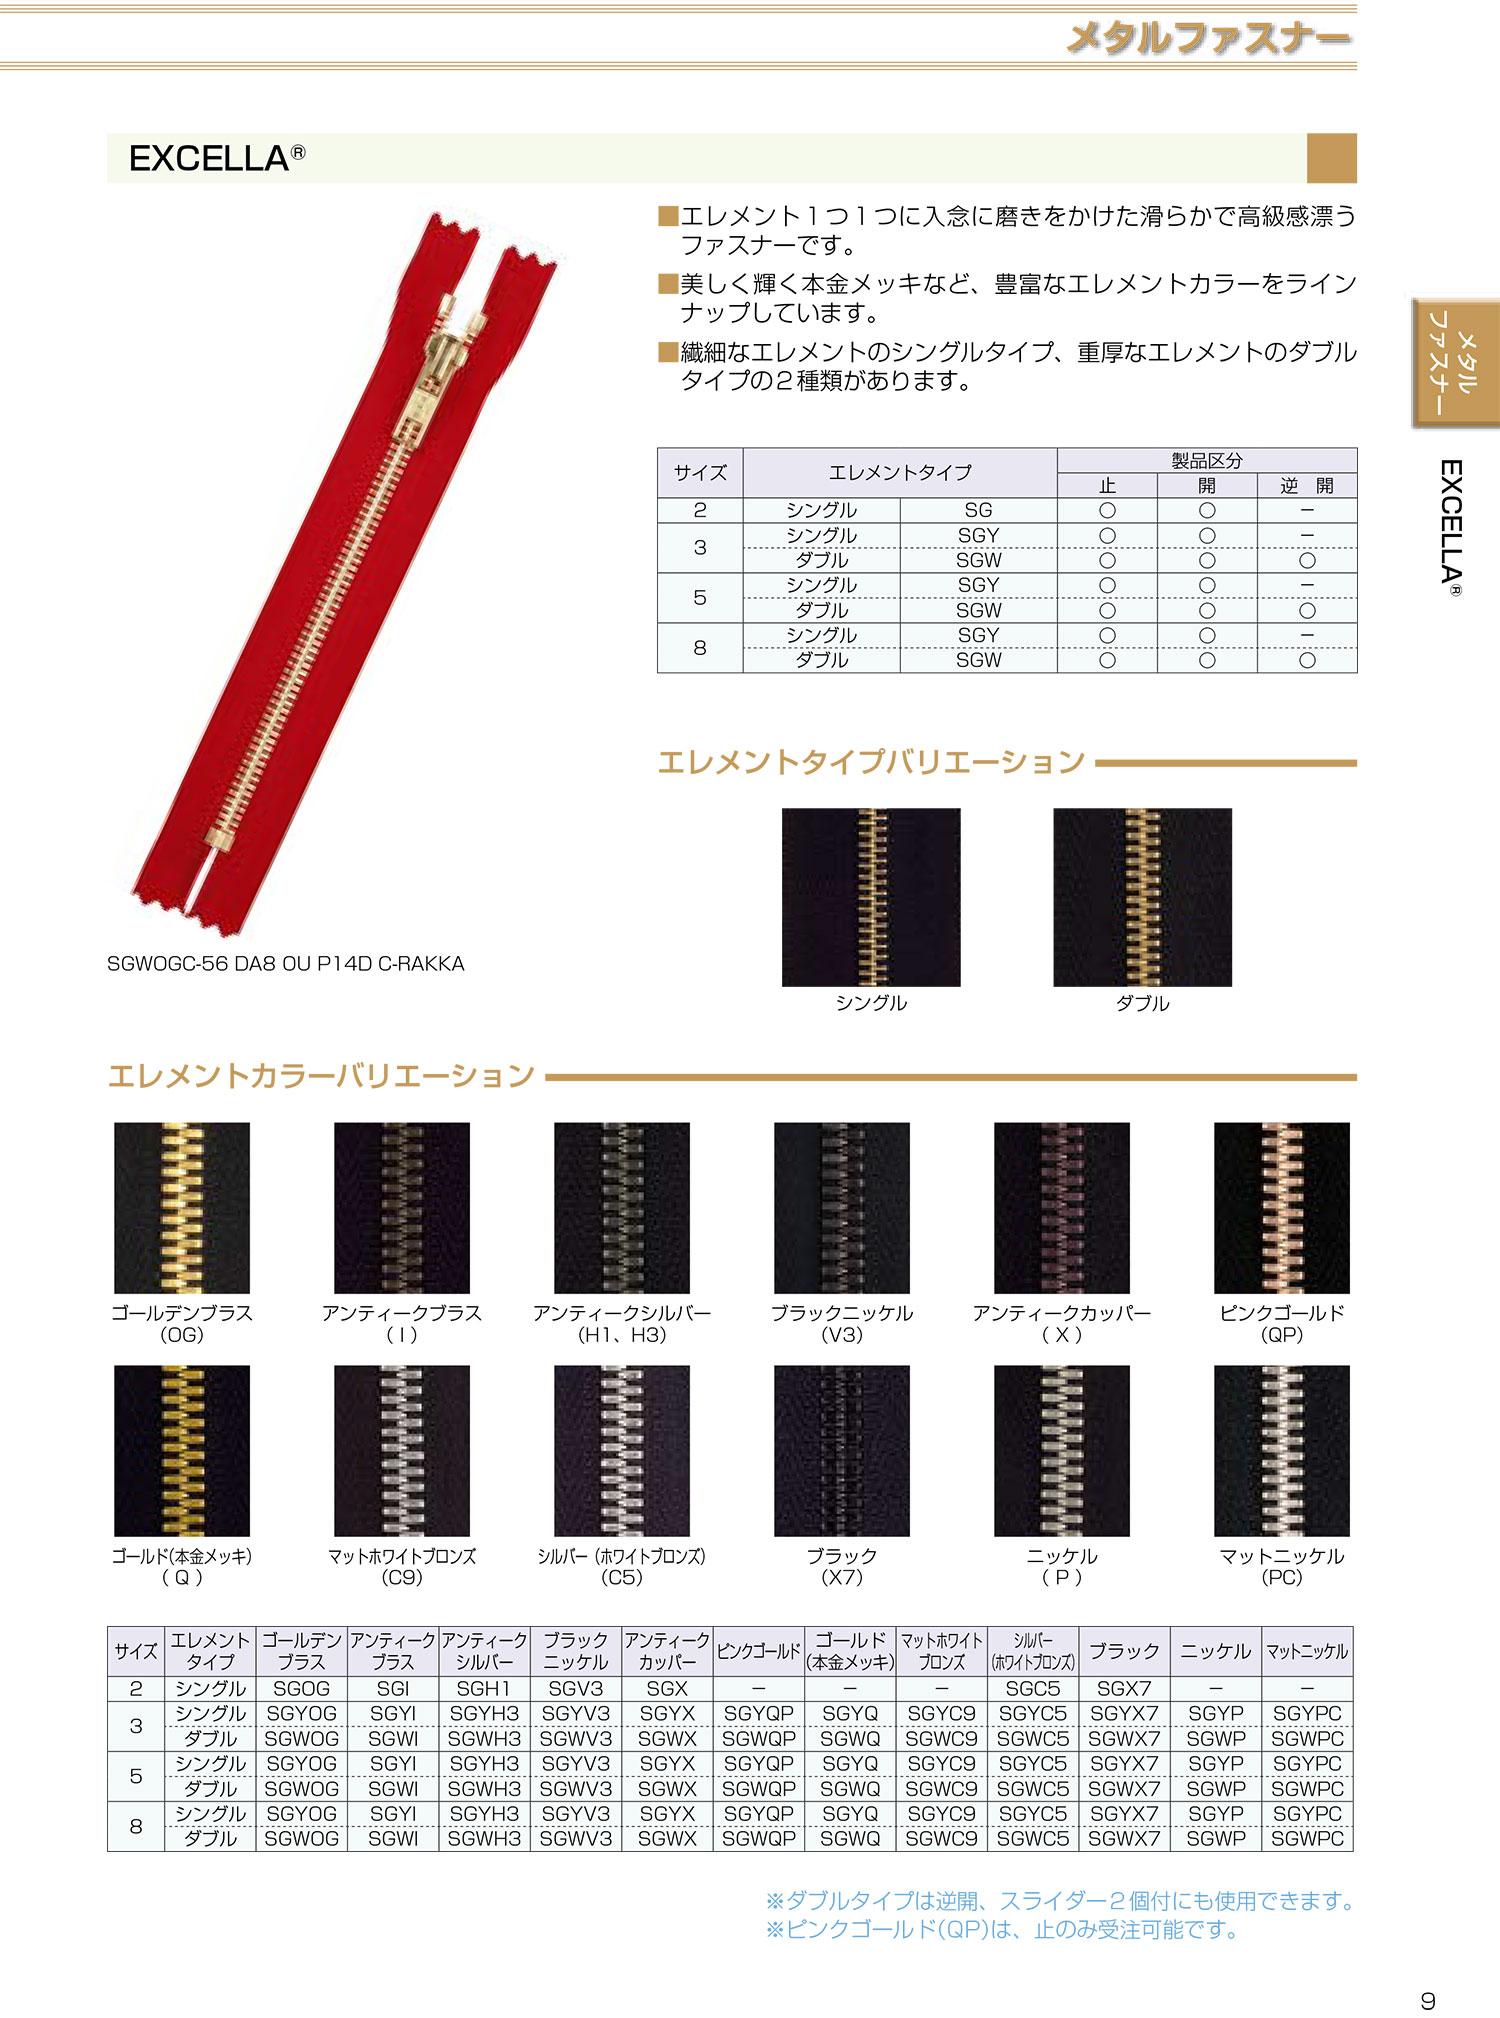 5SGWC5MR エクセラ 5サイズ シルバー(ホワイトブロンズ) 逆開 ダブル[ファスナー] YKK/オークラ商事 - ApparelX アパレル資材卸通販